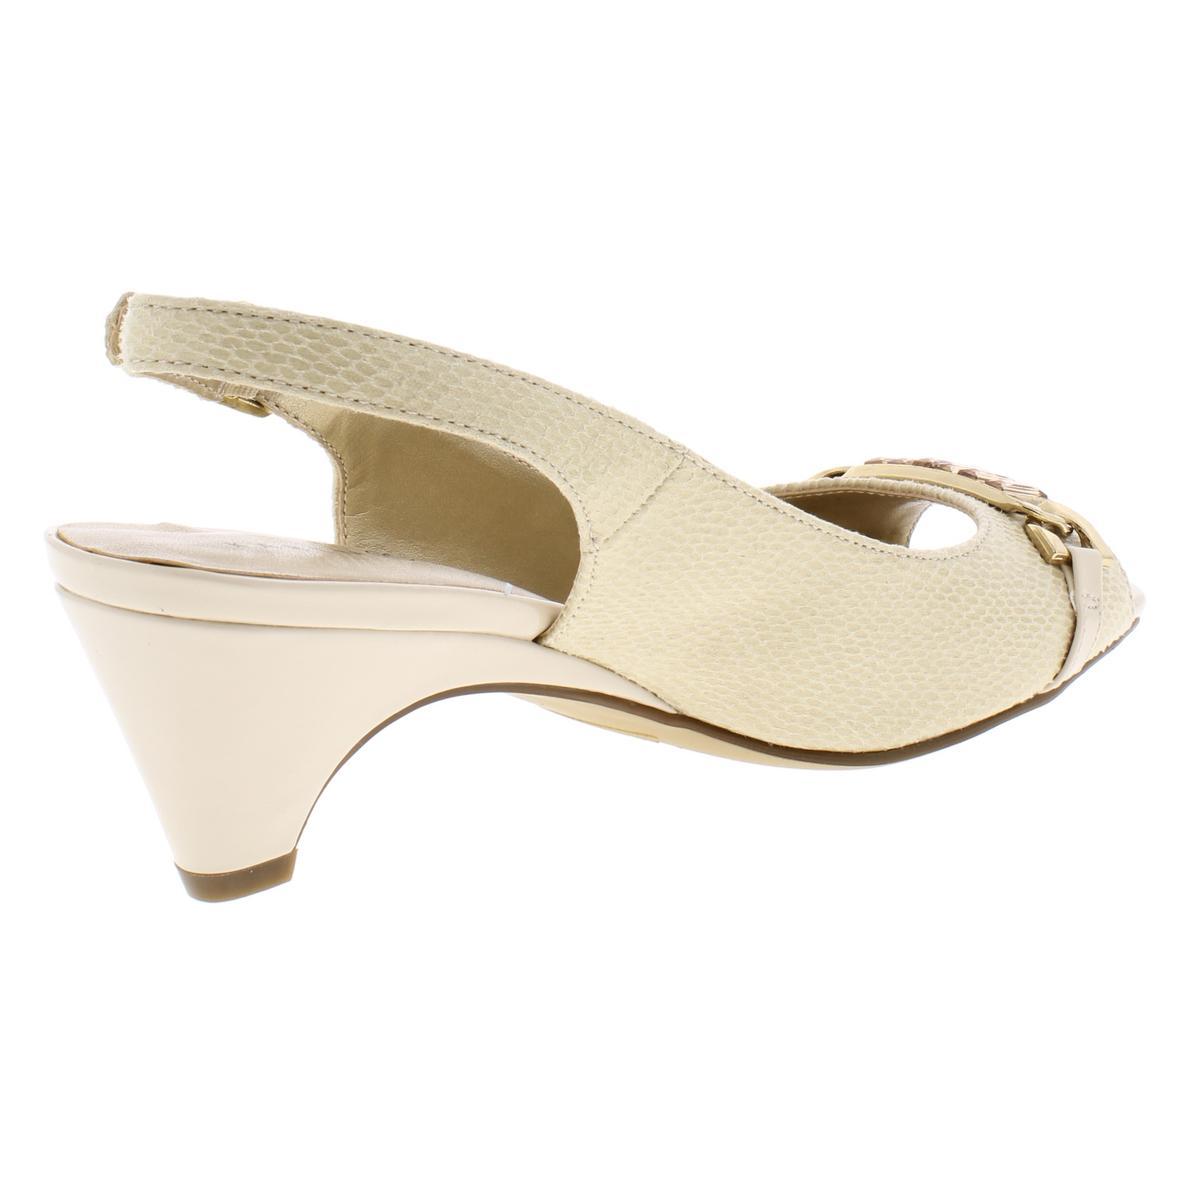 Karen-Scott-Womens-Anyaa-Patent-Square-Toe-Slingback-Heels-Shoes-BHFO-5914 thumbnail 4